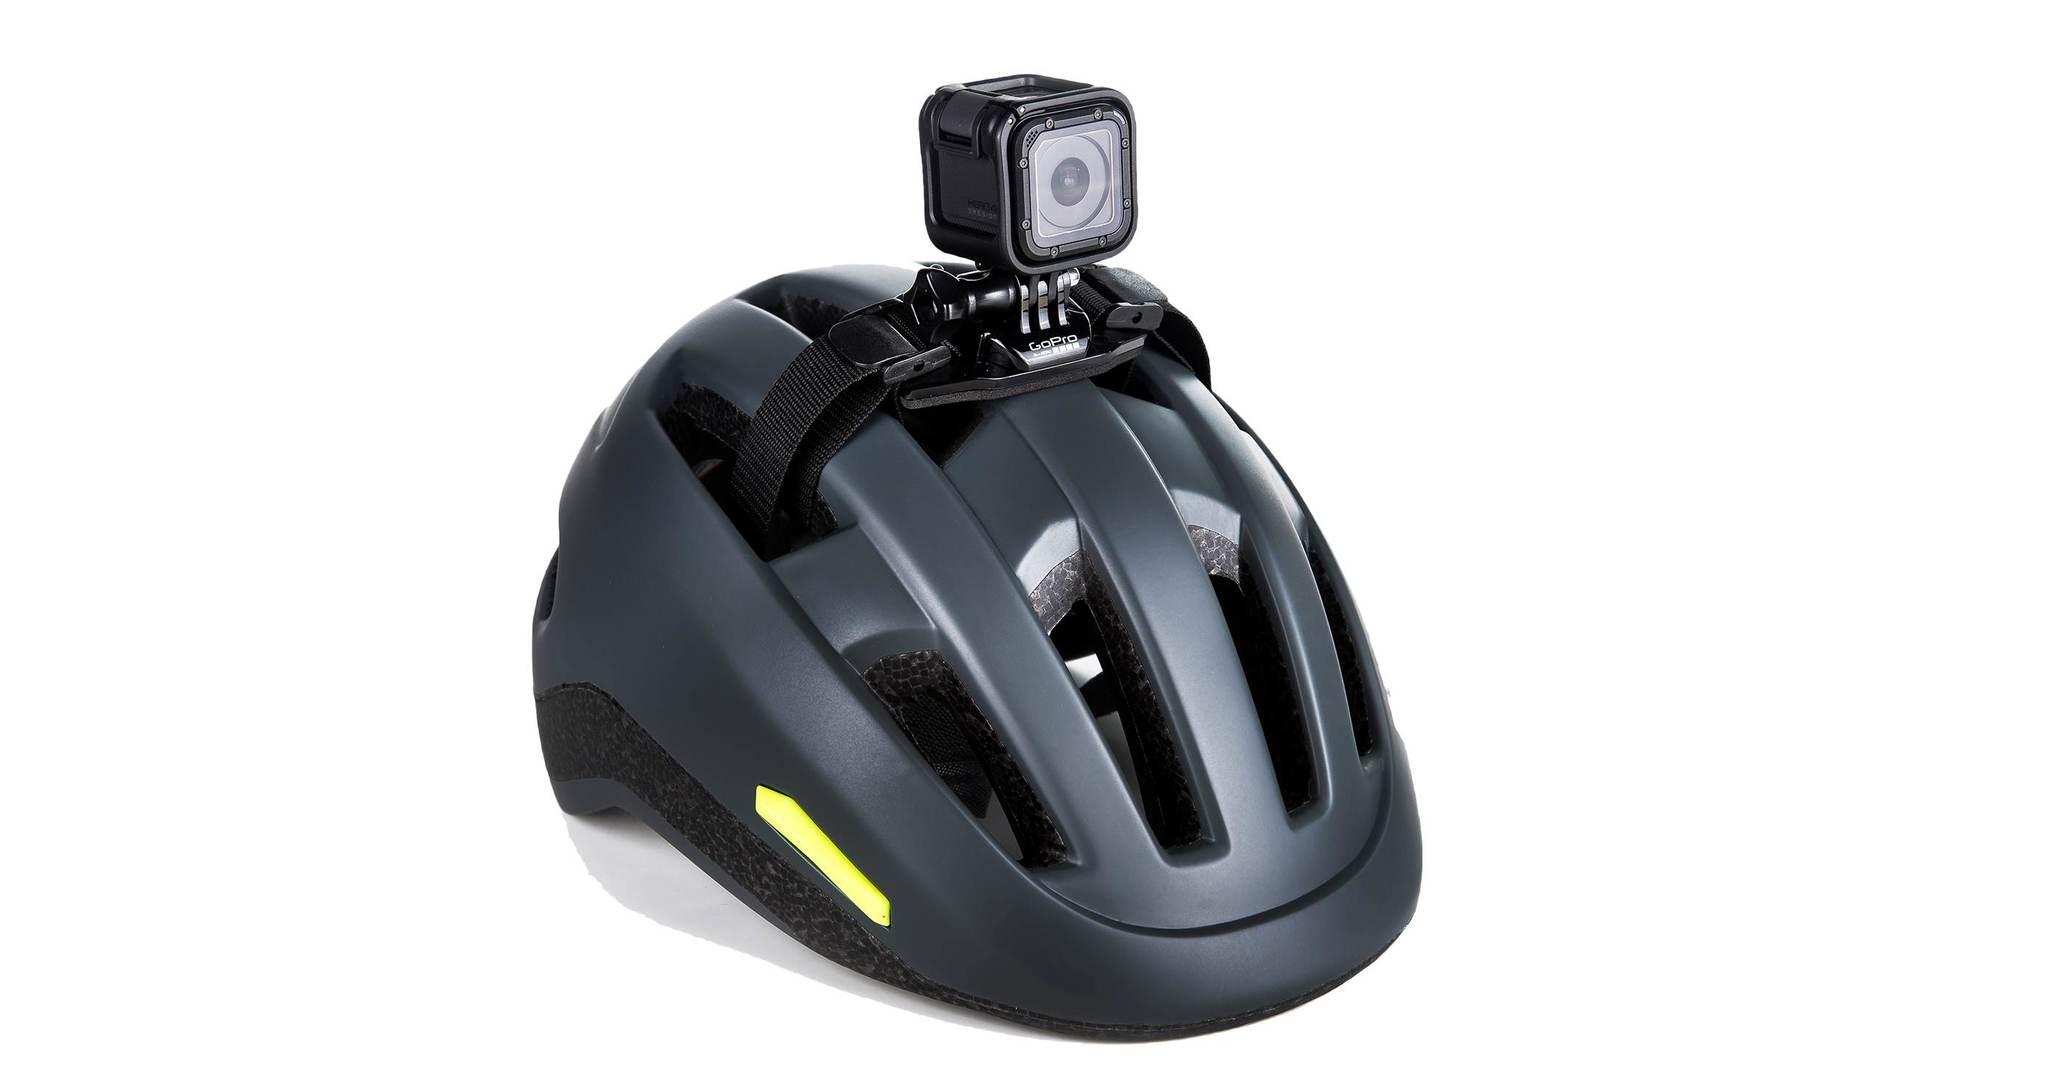 Крепление на вентилируемый шлем GoPro Vented Helmet Strap Mount (GVHS30) на шлеме